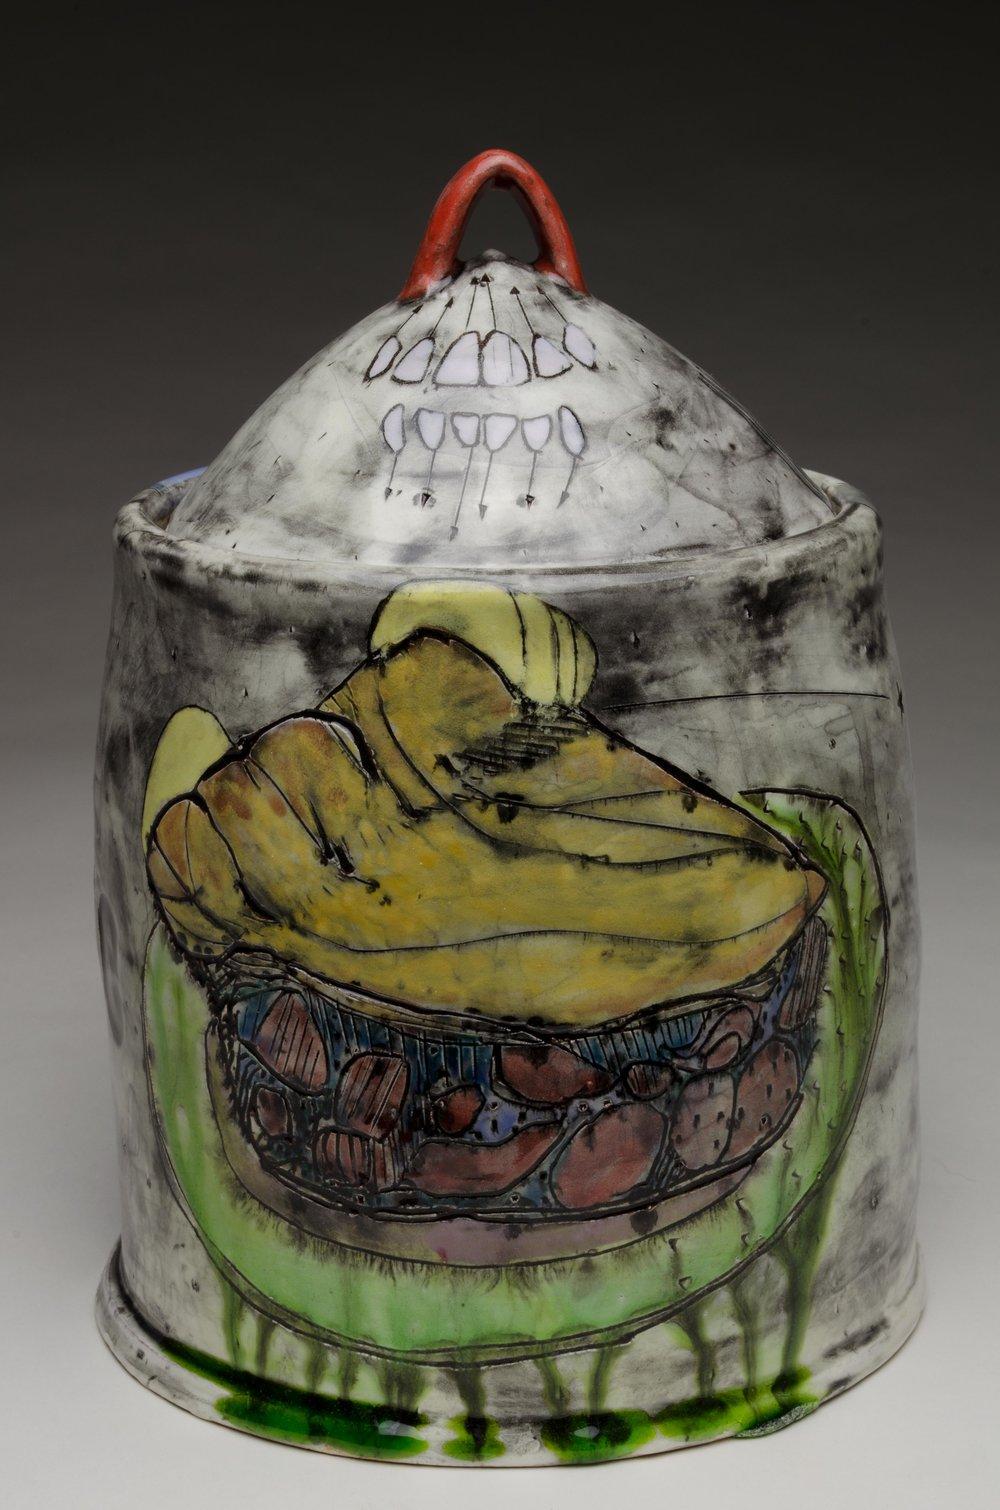 Jay Owens, Ceramics: Exploration in Hand-Building Techniques